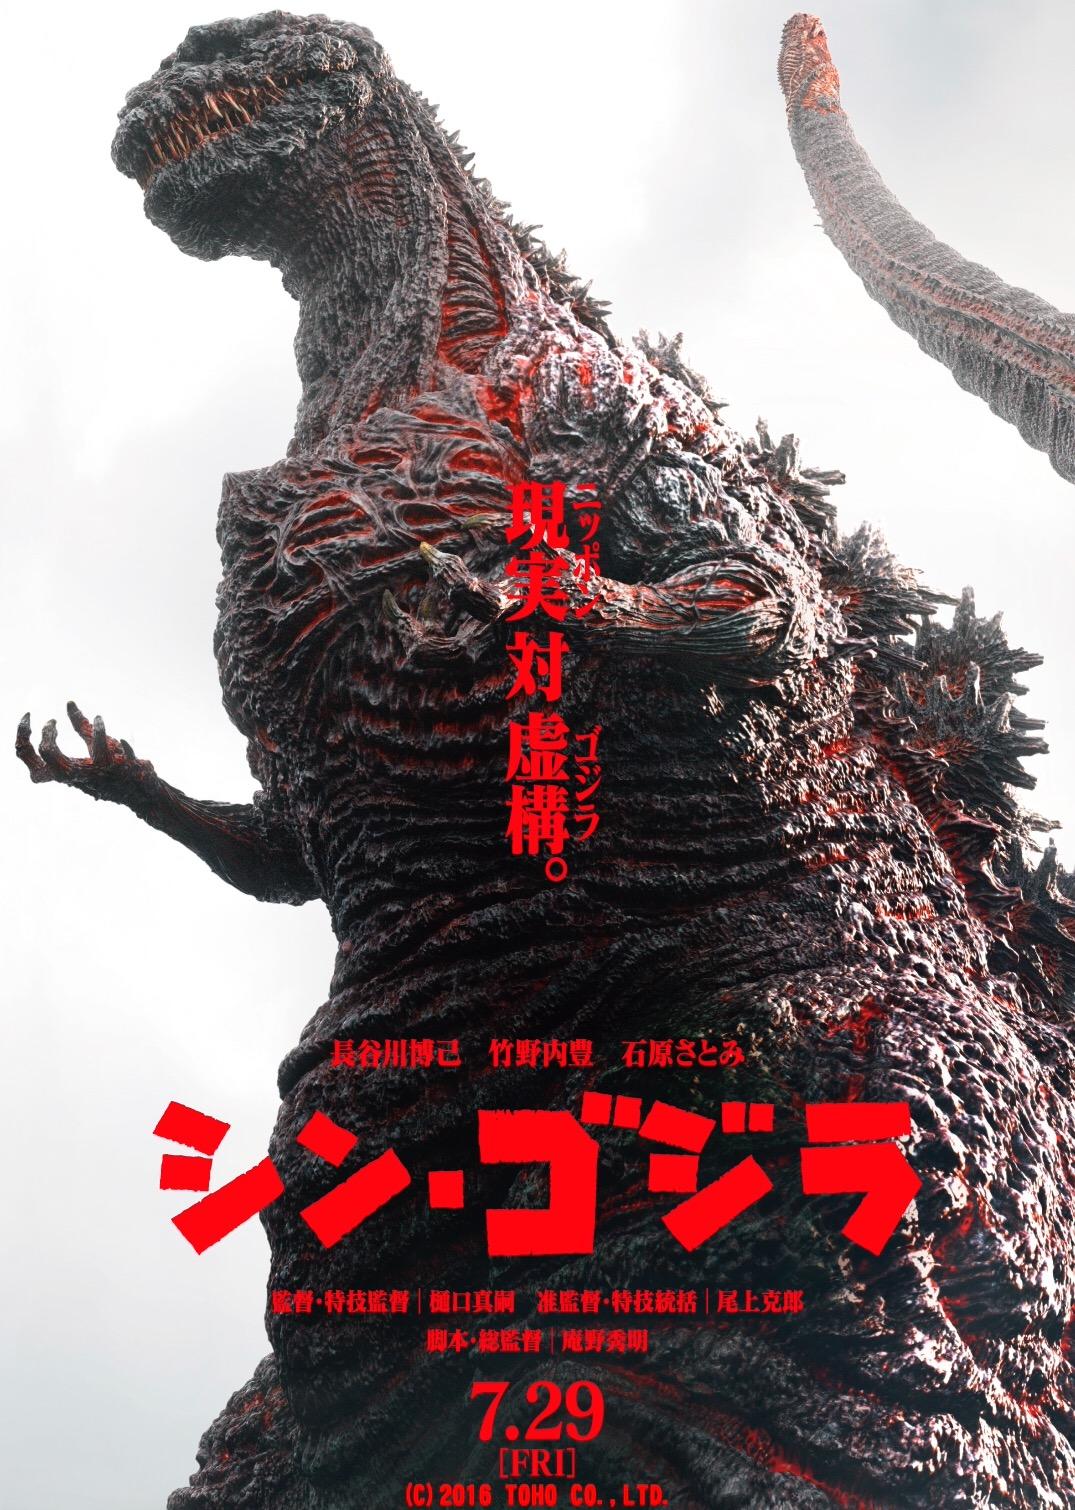 Shin Godzilla (2016) - Directed By: Hideaki Anno, Shinji HiguchiStarring: Hiroki Hasegawa, Yutaka Takenouchi, Satomi IshiharaRated: NRRun Time: 2hTMM Score: 4 StarsStrengths: Editing, Score, Direction, Scope/ScaleWeakness: Certain Effects Shots, Any American Character